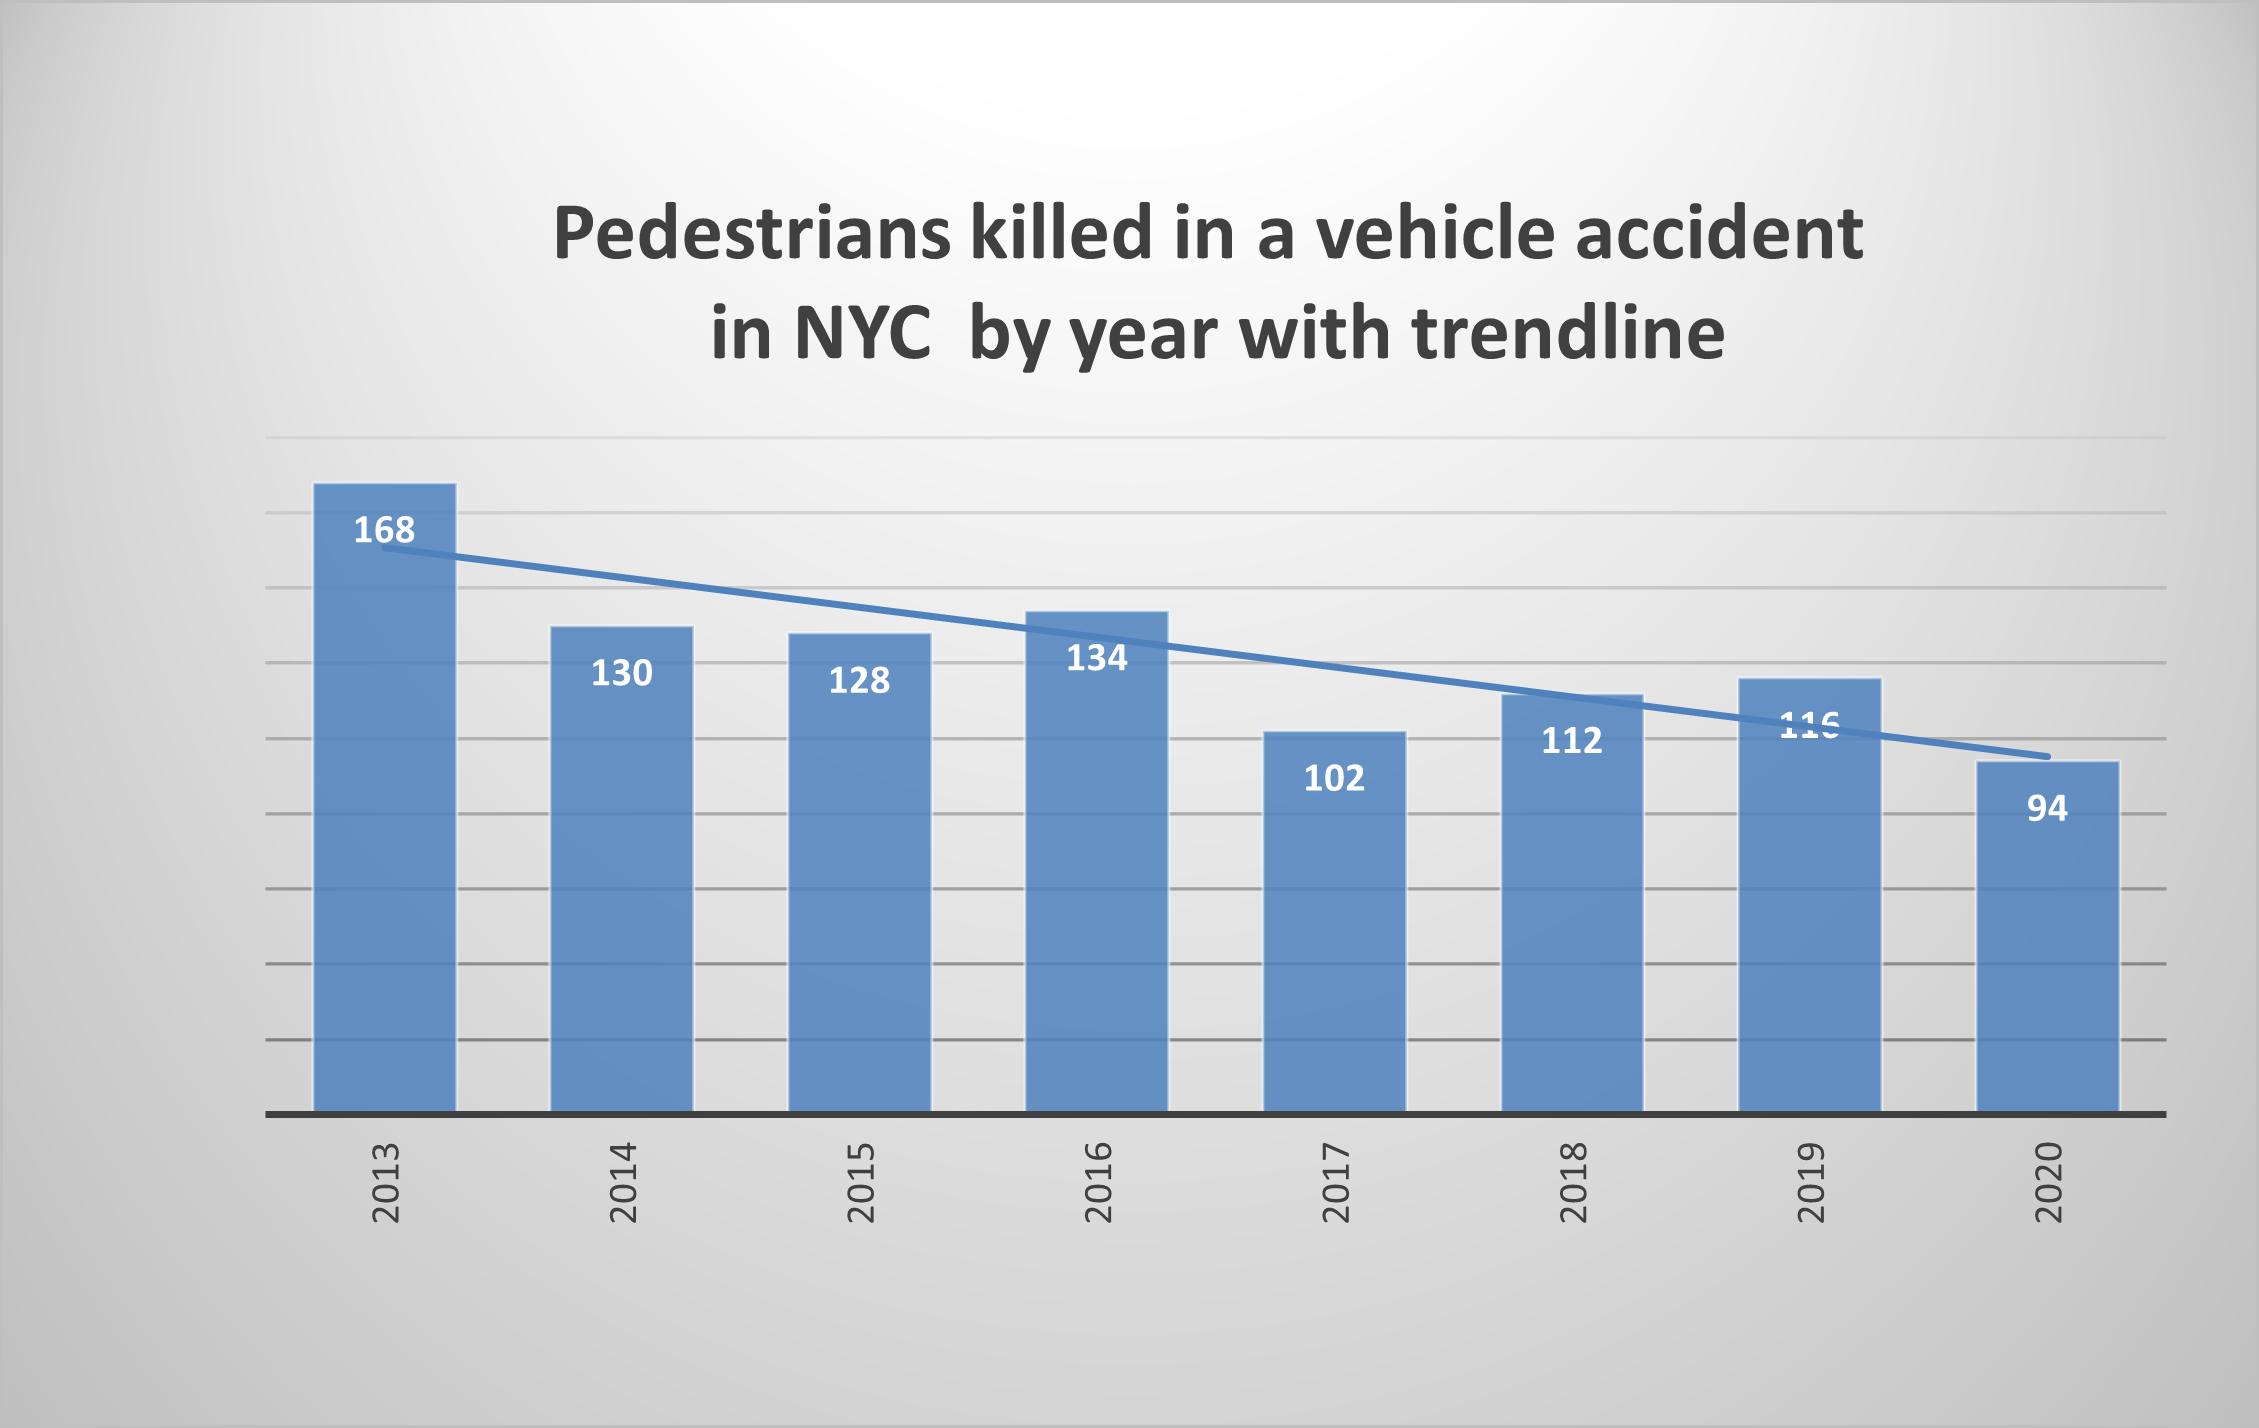 NYC Pedestrian fatalities 2020